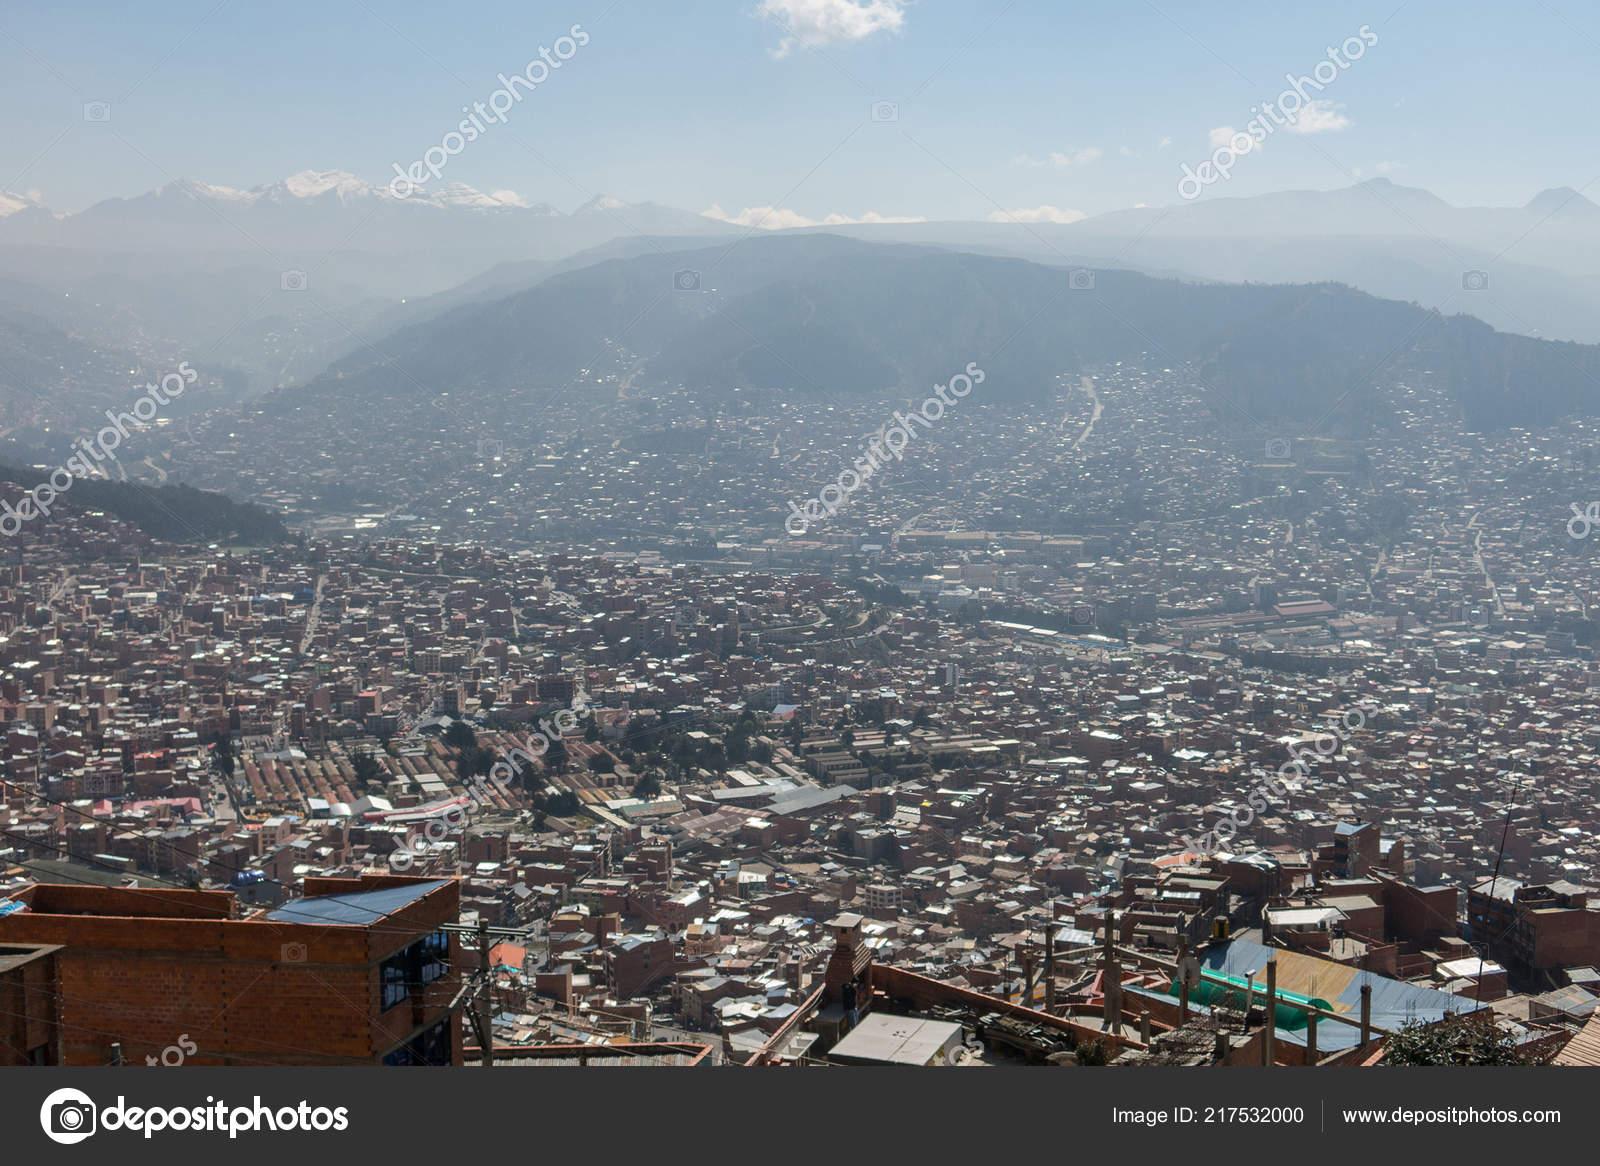 City Paz High Andes Mountains Bolivia Viewed Mirador Kilikili Background Stock Photo C Toniflap 217532000